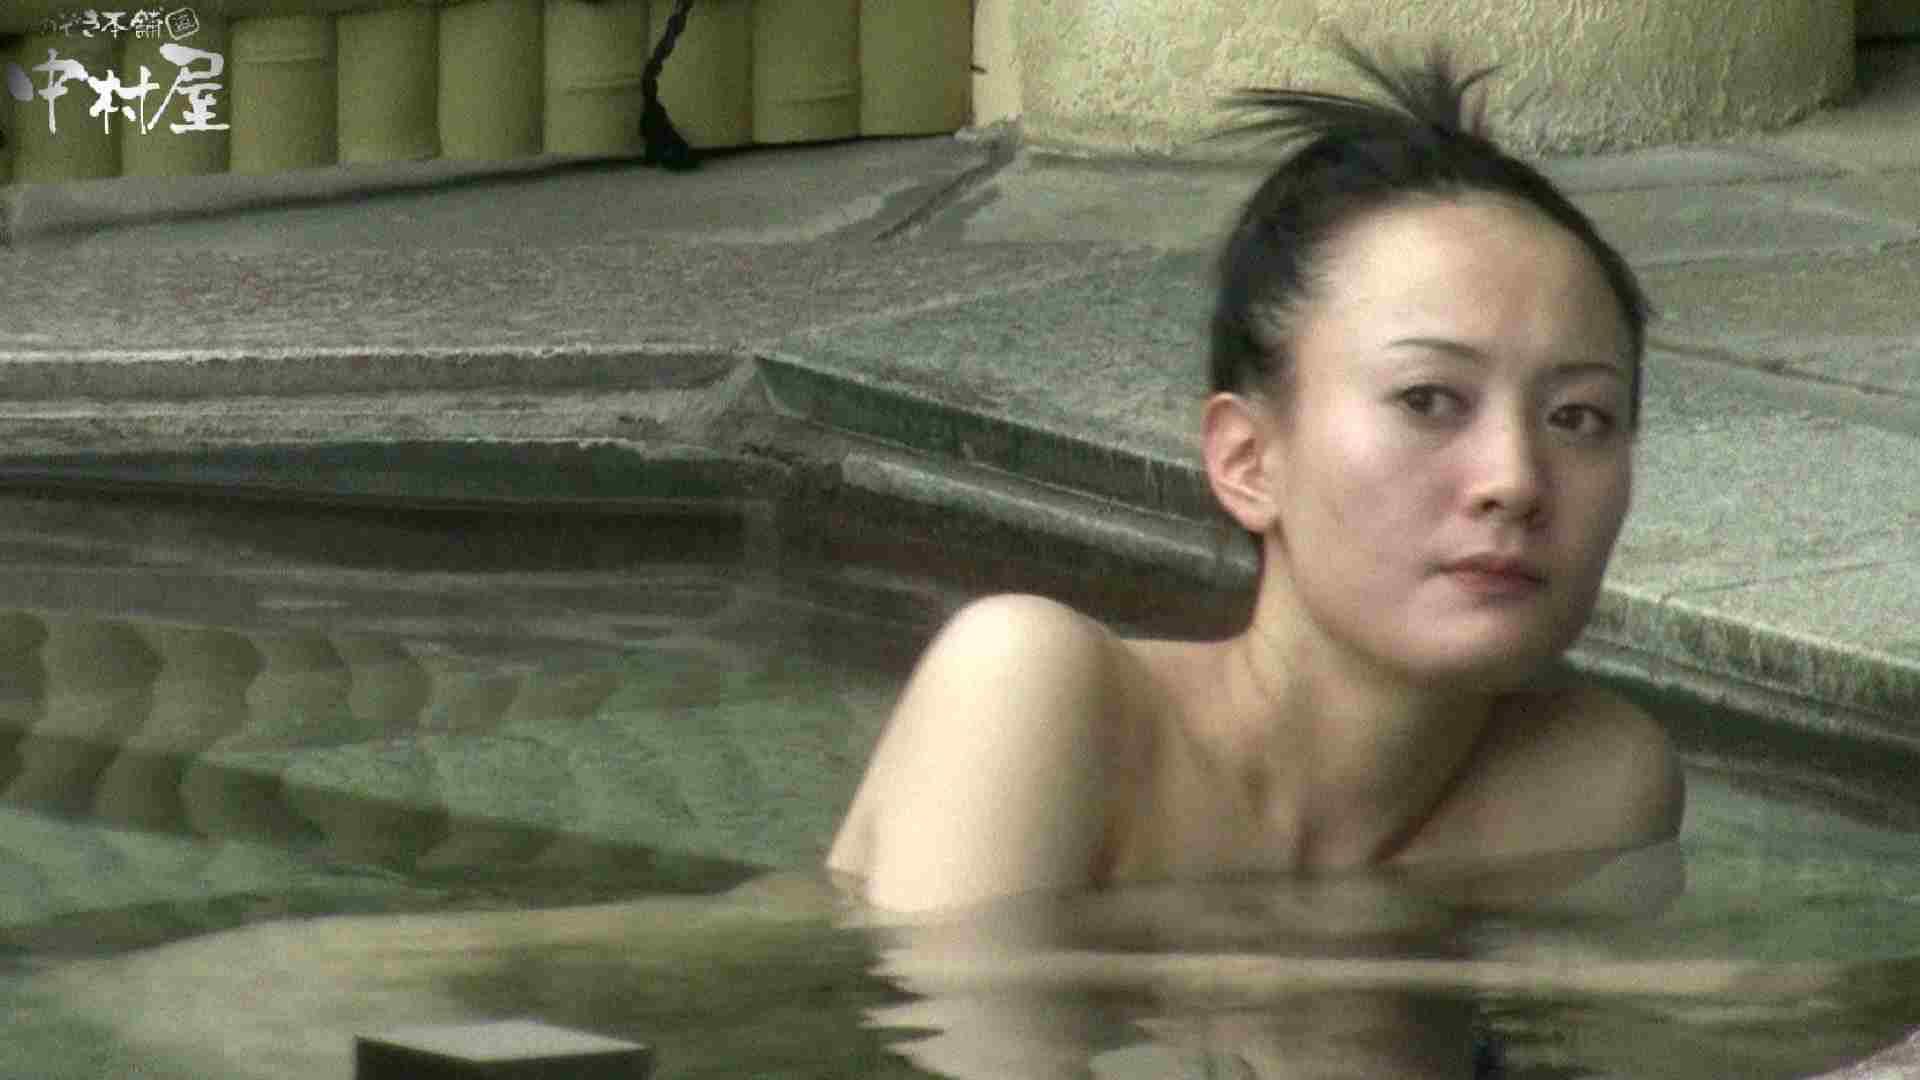 Aquaな露天風呂Vol.900 盗撮シリーズ | 露天風呂編  110PIX 45